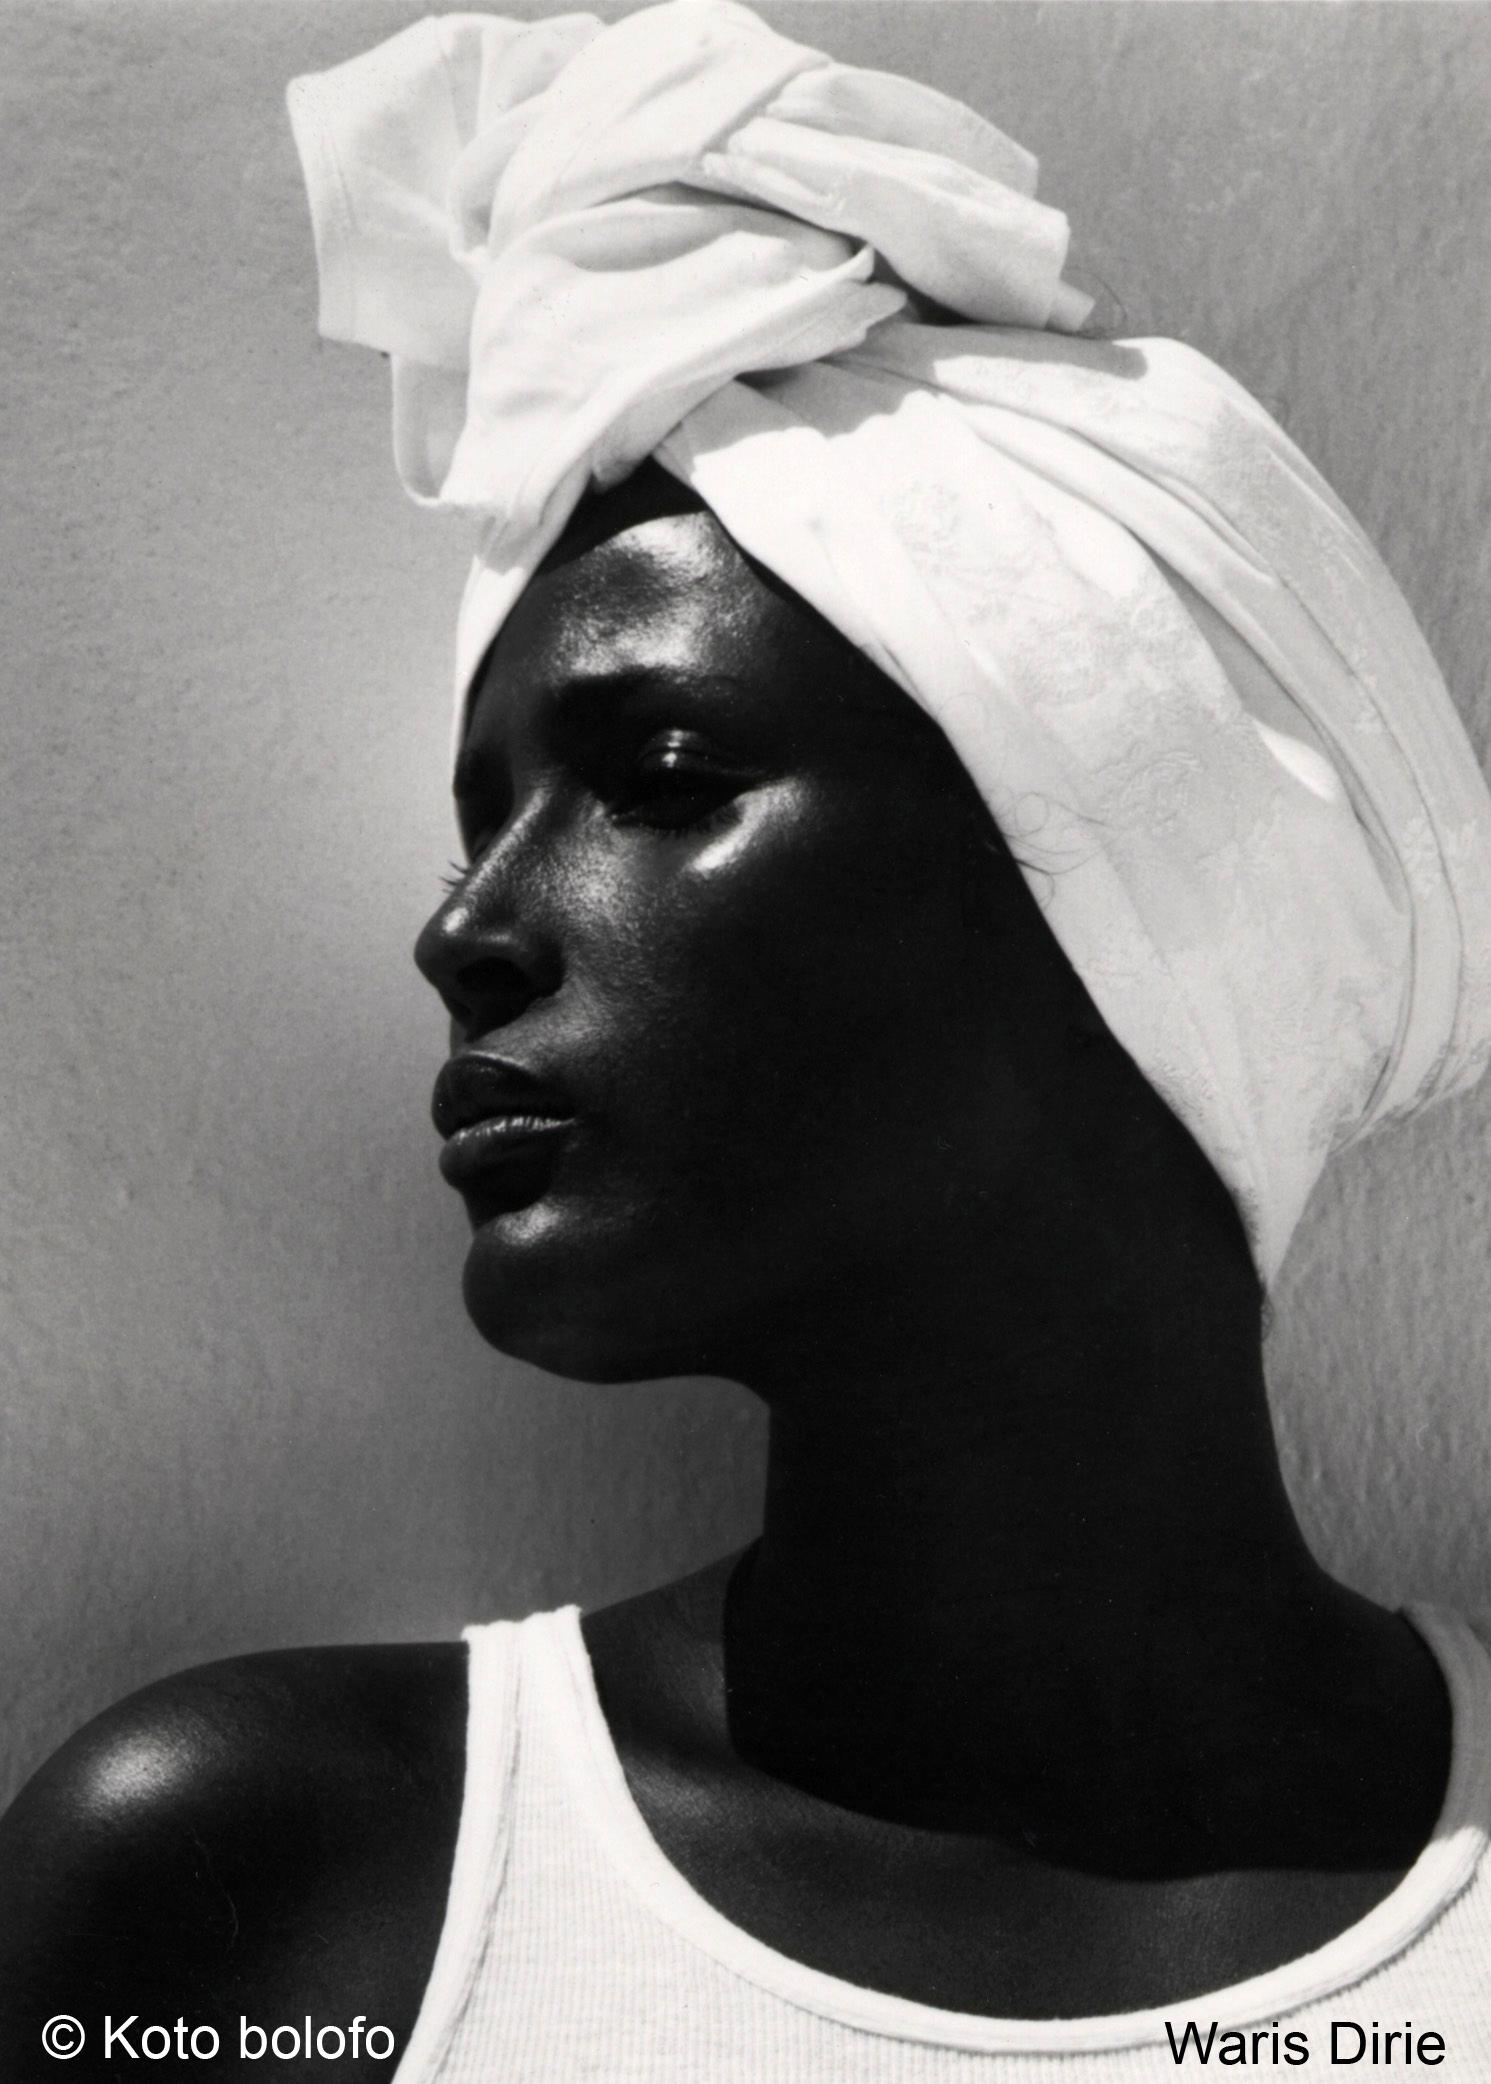 koto bolofo_Waris Dirie | Photography women, Fashion photography, Fashion model photography